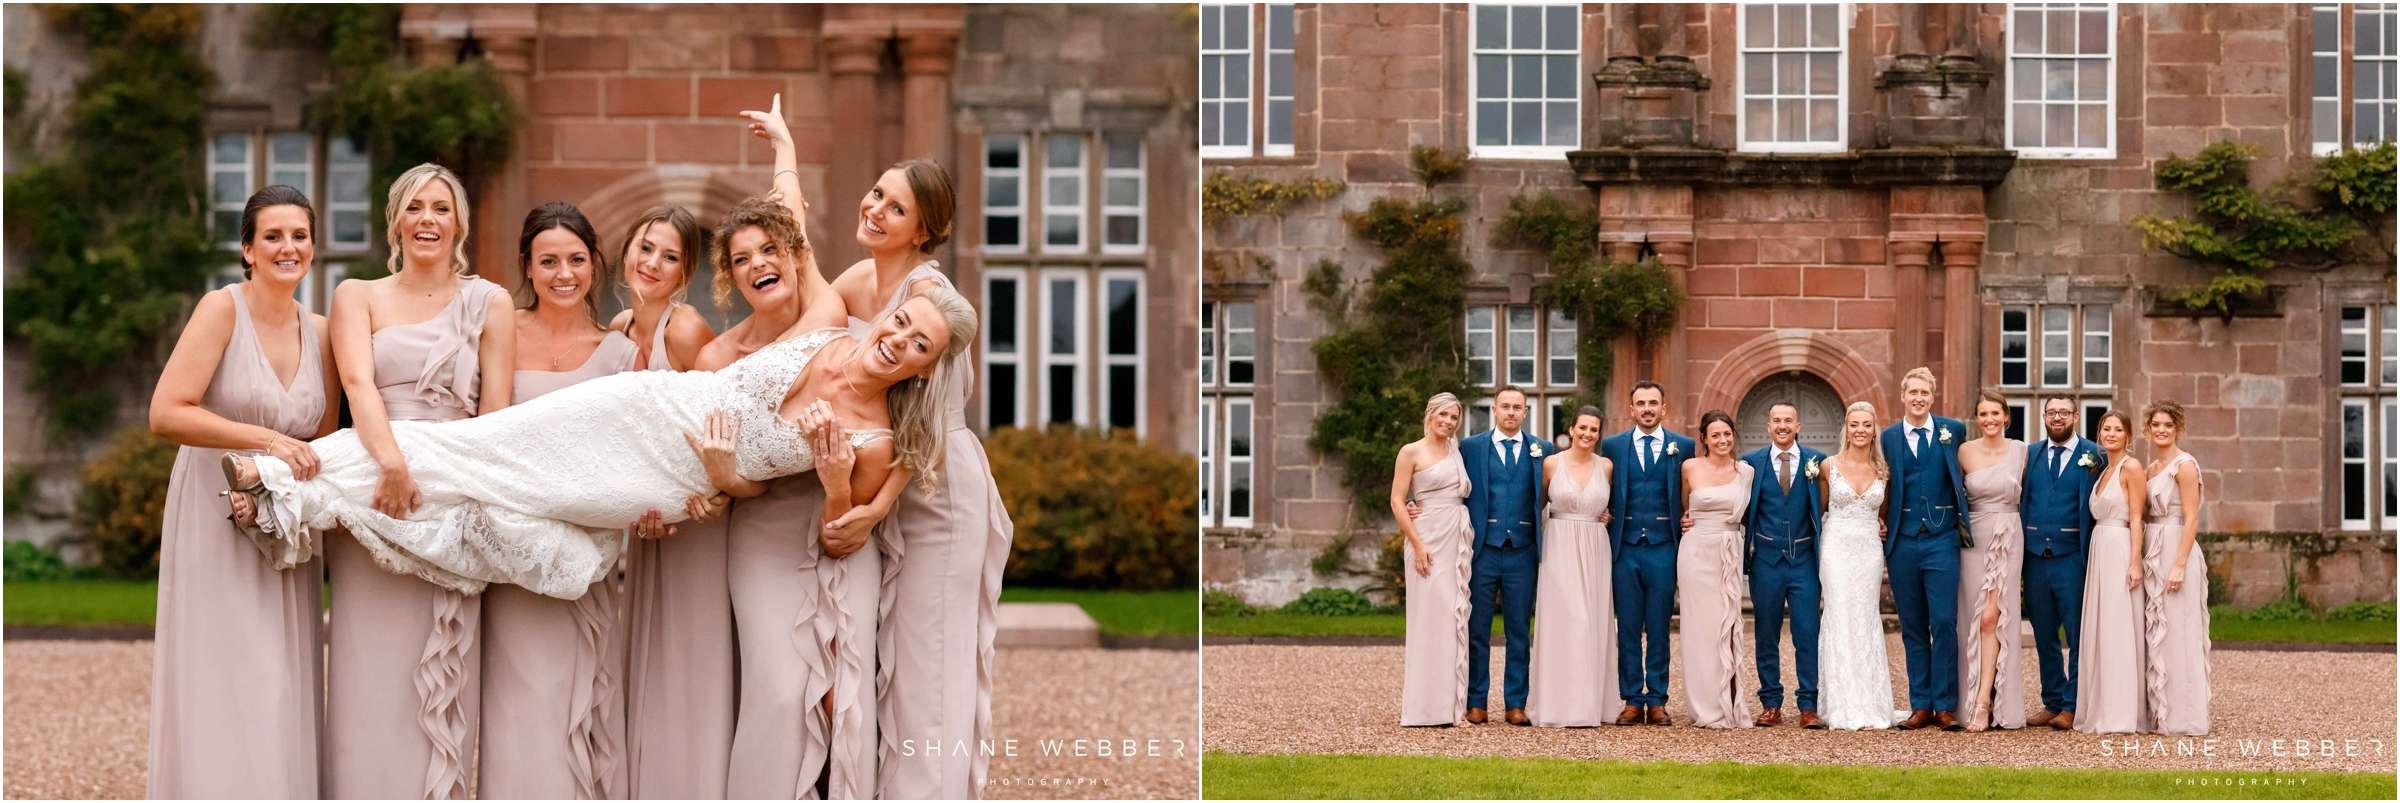 Davids Bridal bridesmaids dresses